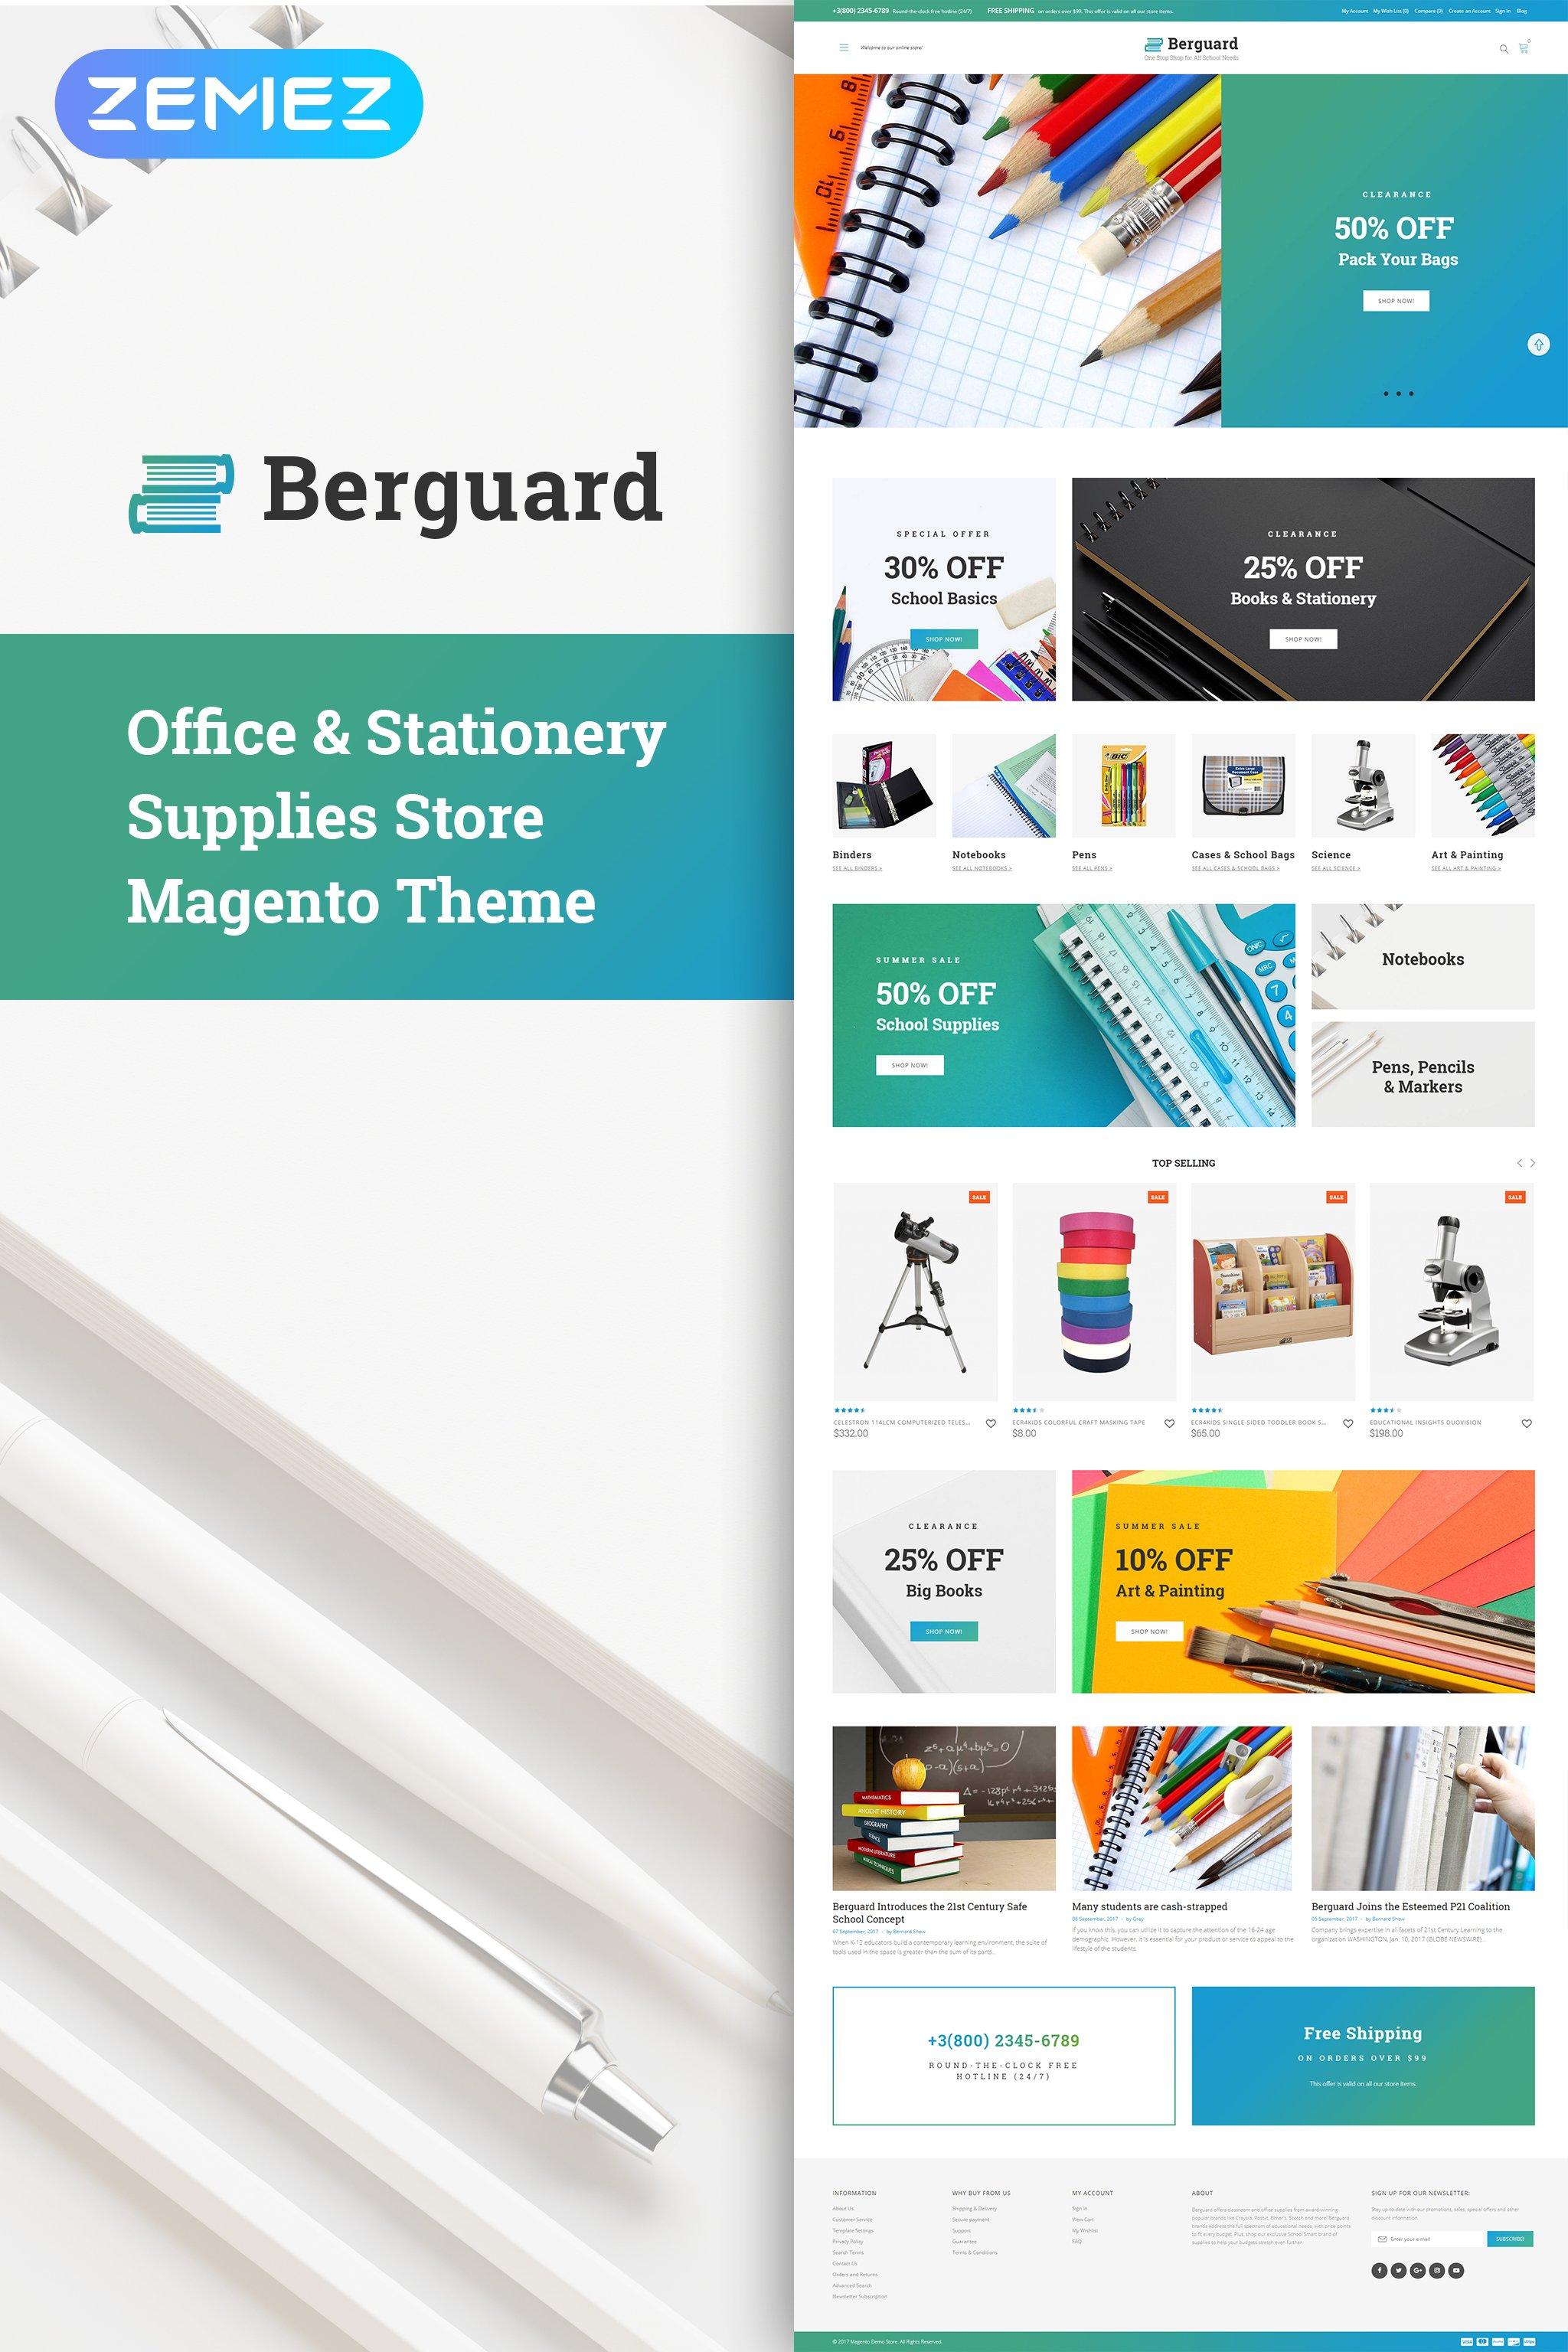 Berguard - Office & Stationery Supplies Magento sablon 64137